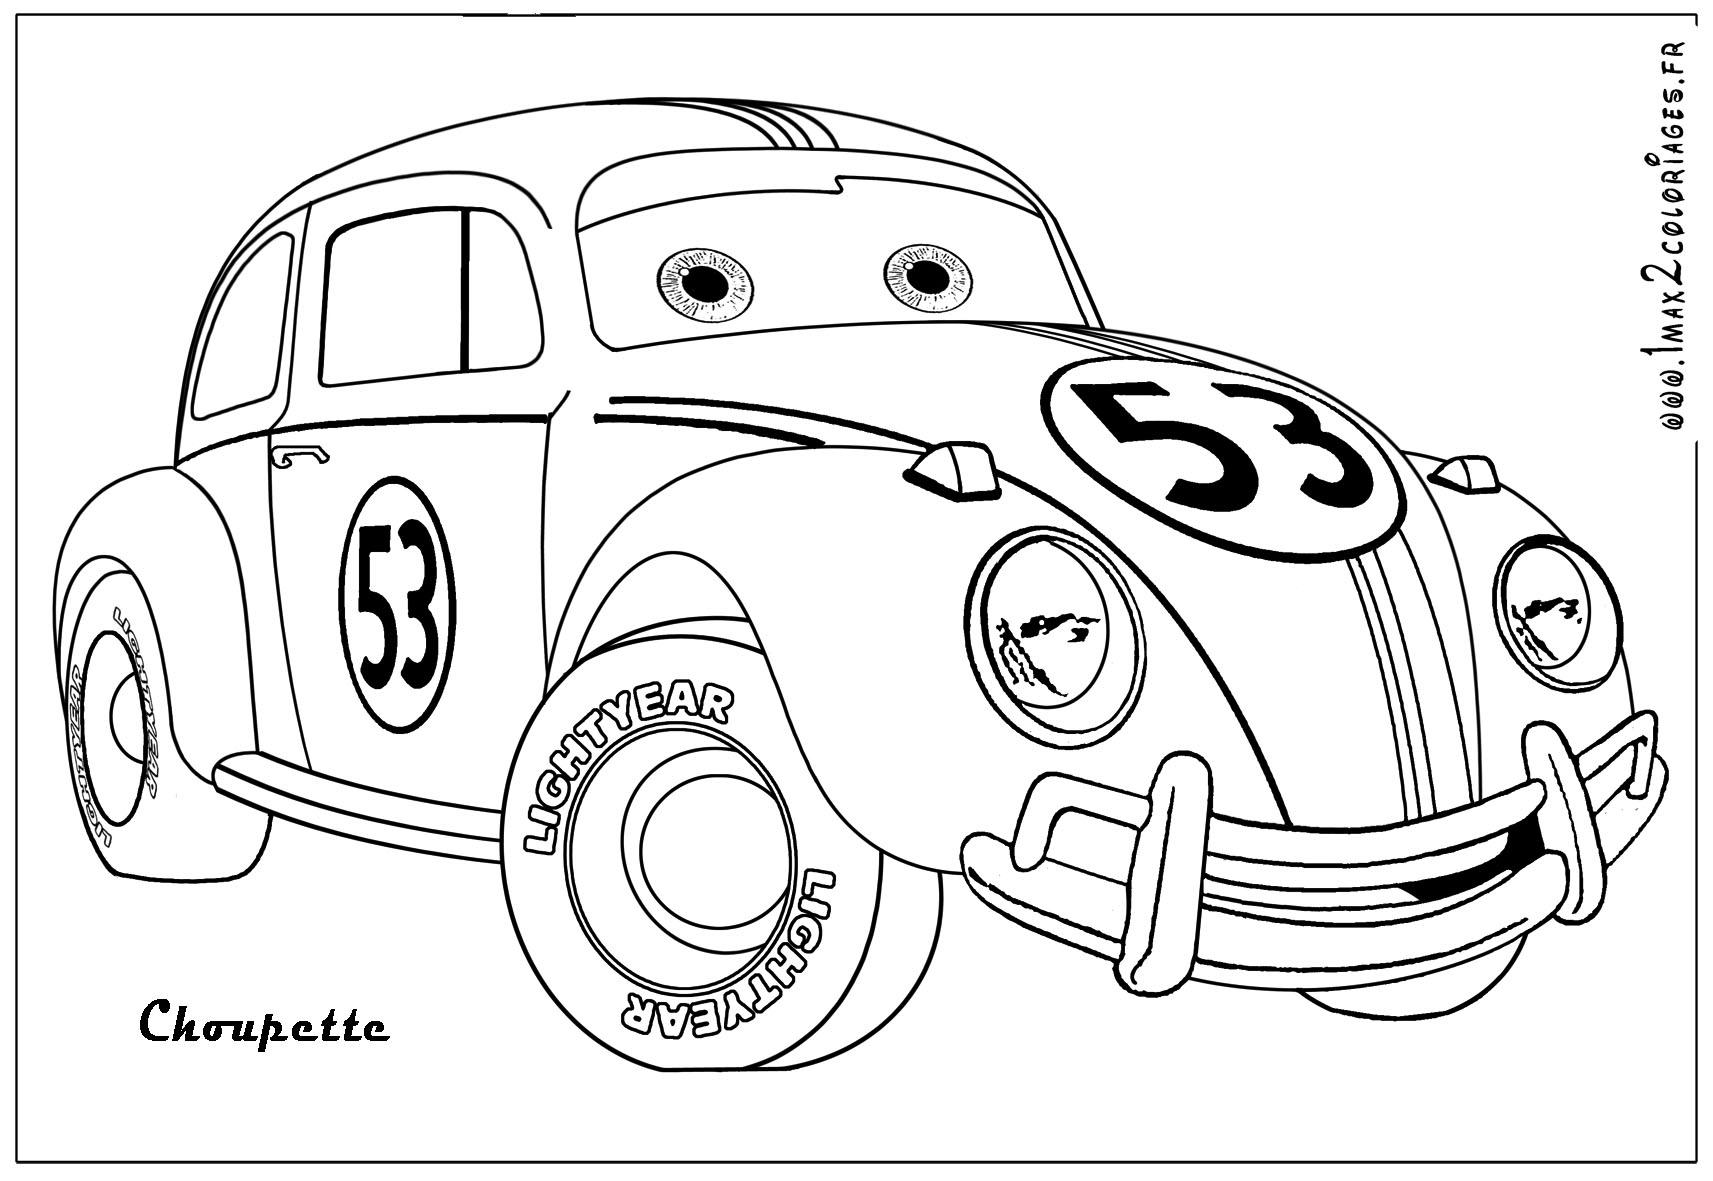 coloriages imprimer voiture num ro 16932. Black Bedroom Furniture Sets. Home Design Ideas